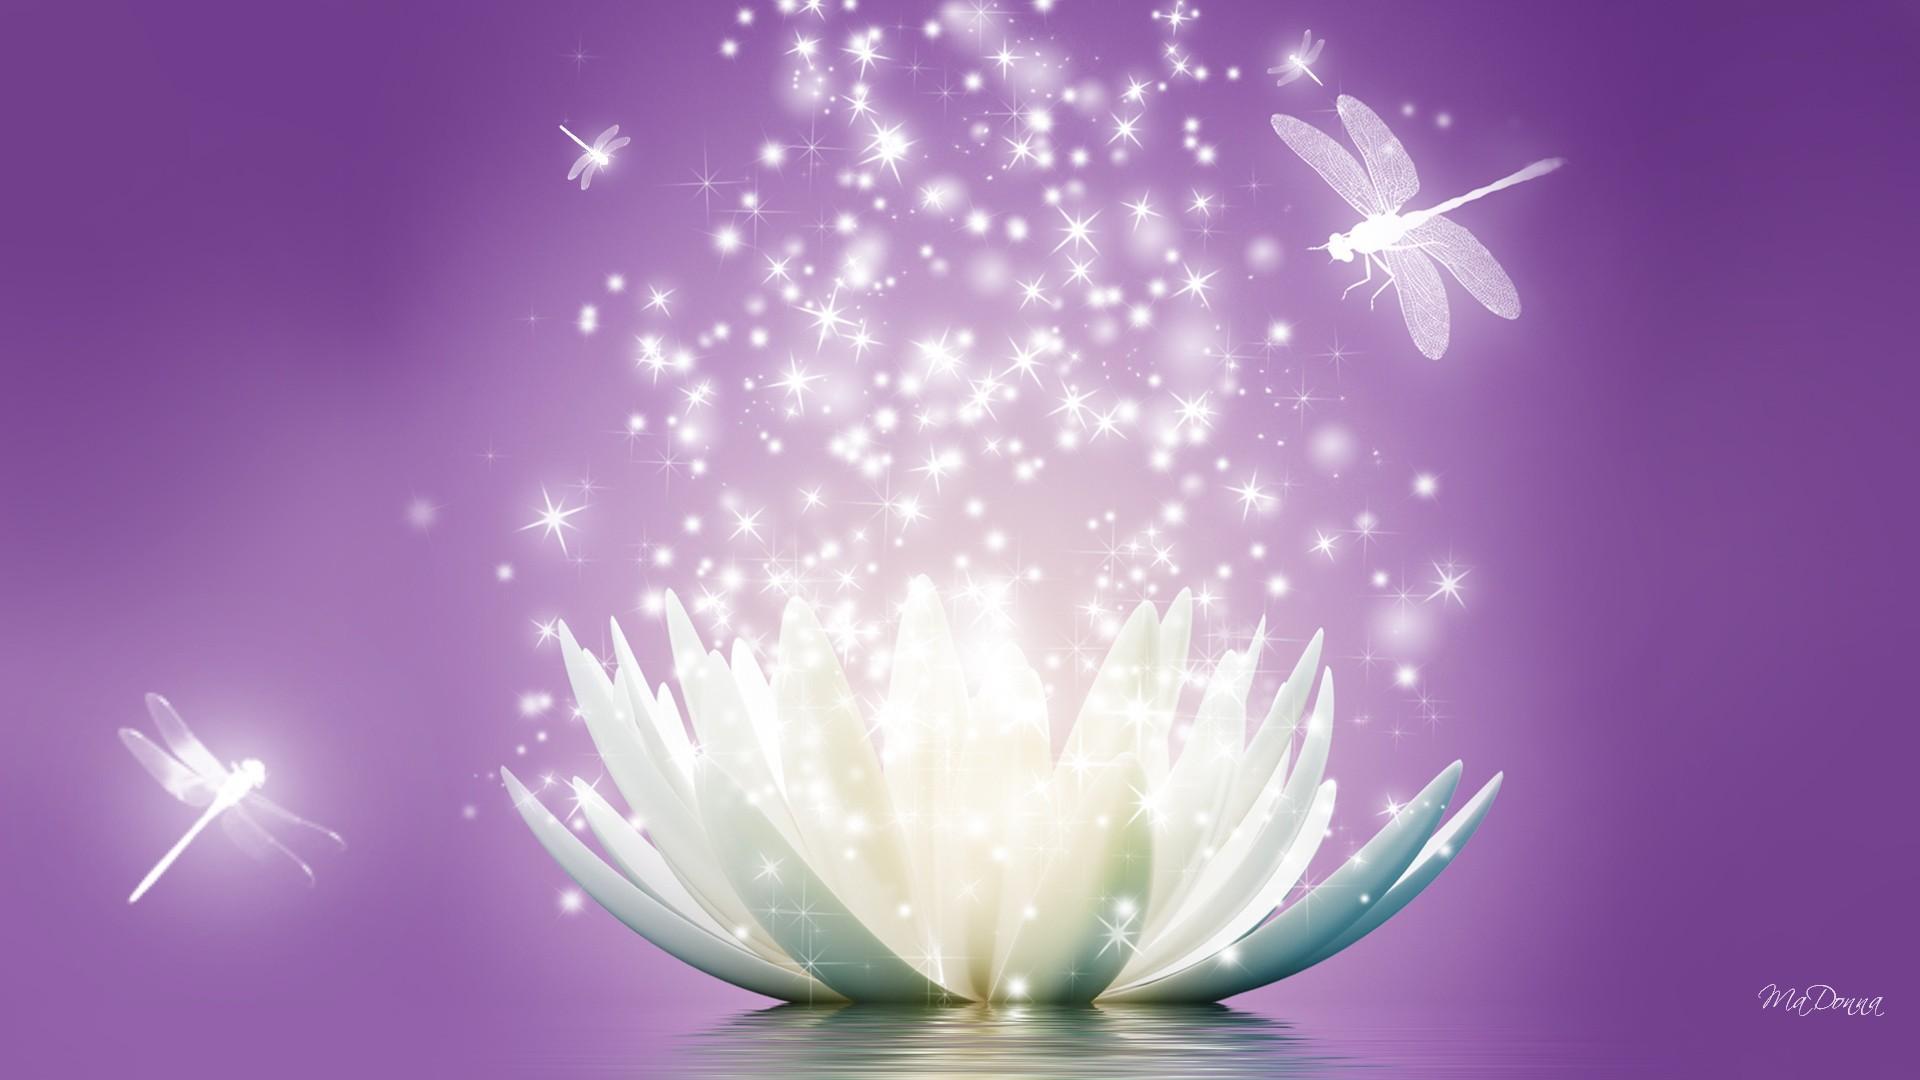 Lotus flower spiritual image collections flower decoration ideas lotus flower spiritual image collections flower decoration ideas lotus flower spiritual image collections flower decoration ideas mightylinksfo